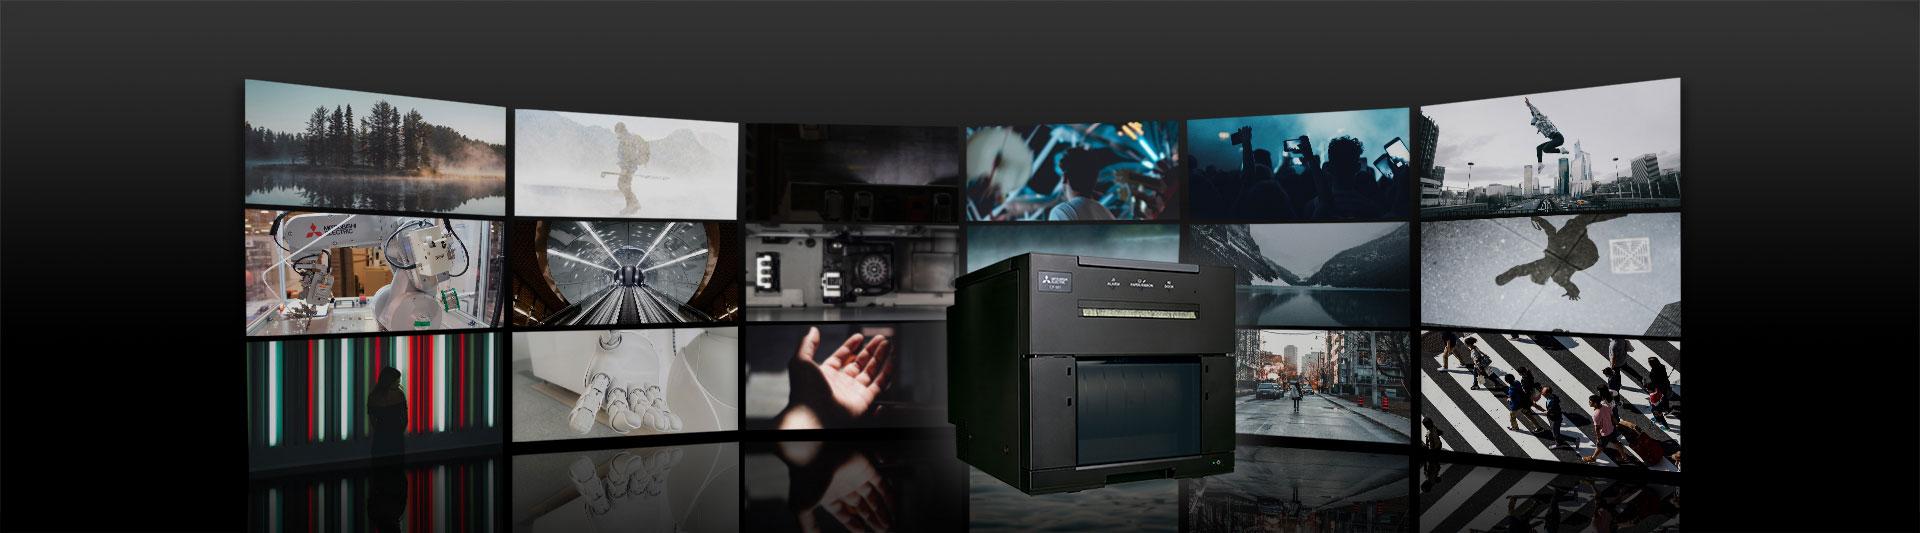 Mitsubishi Electric Photo Printing Solutions